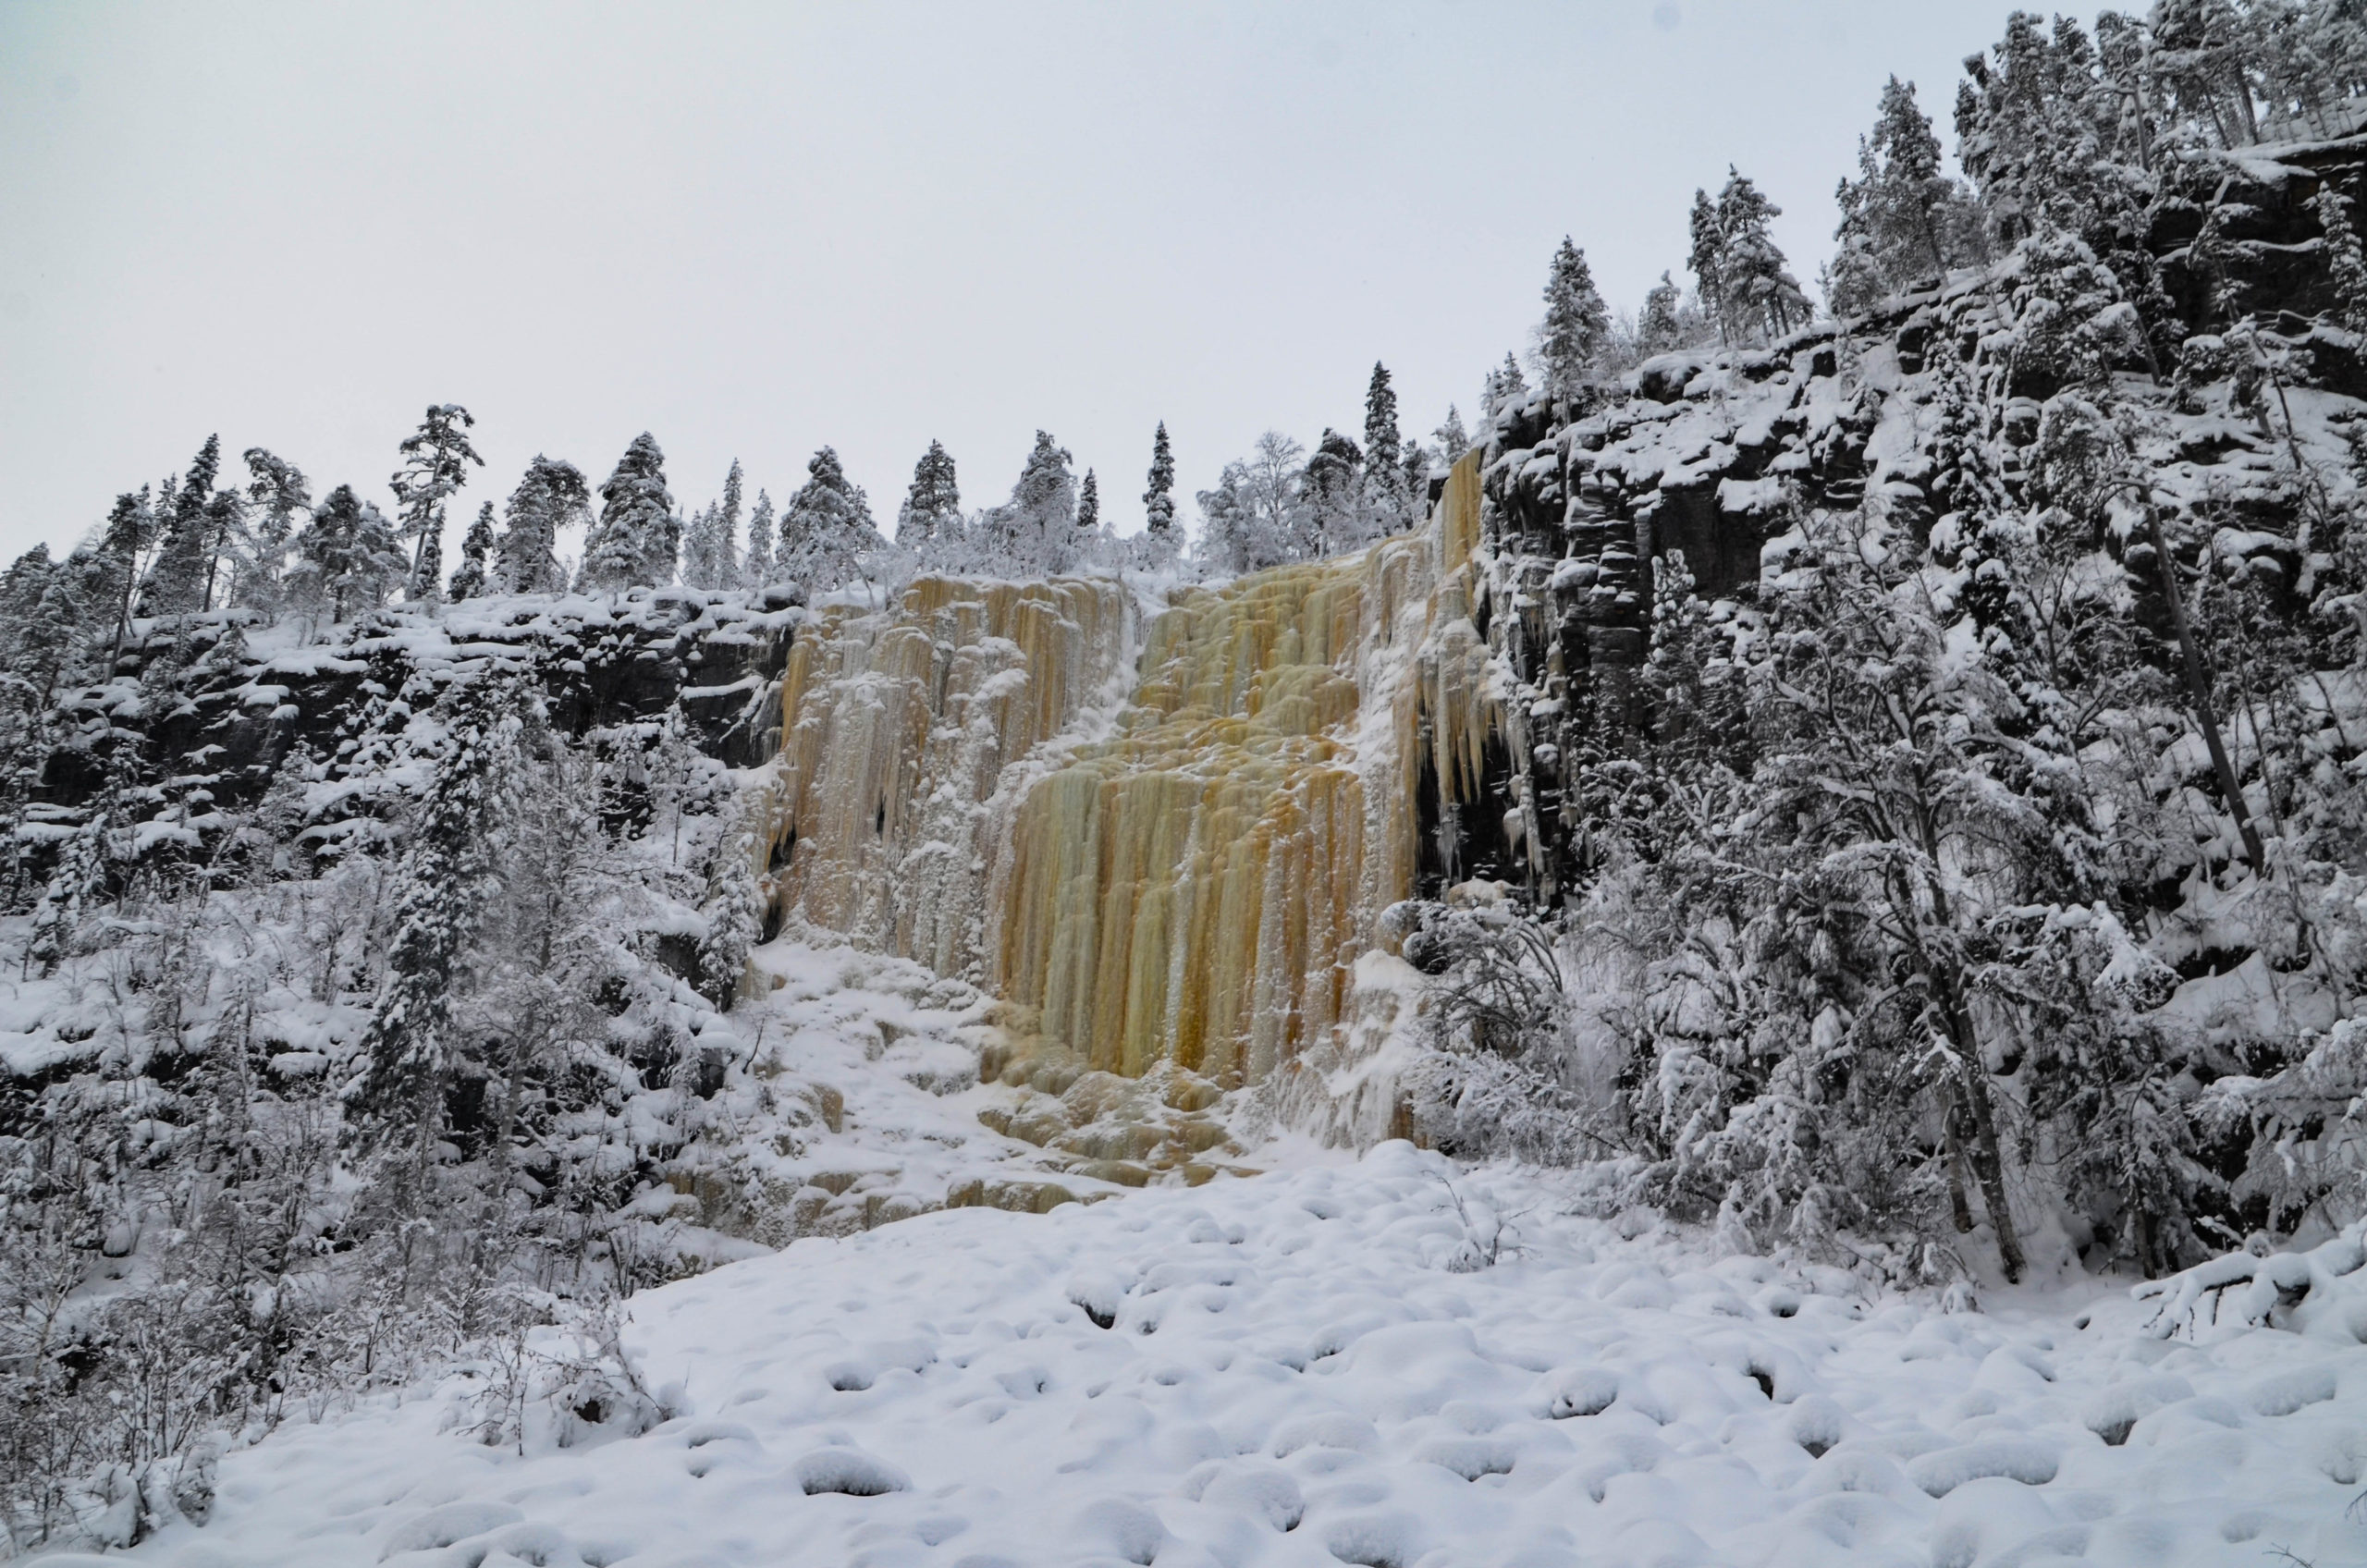 Korouoma from Rovaniemi